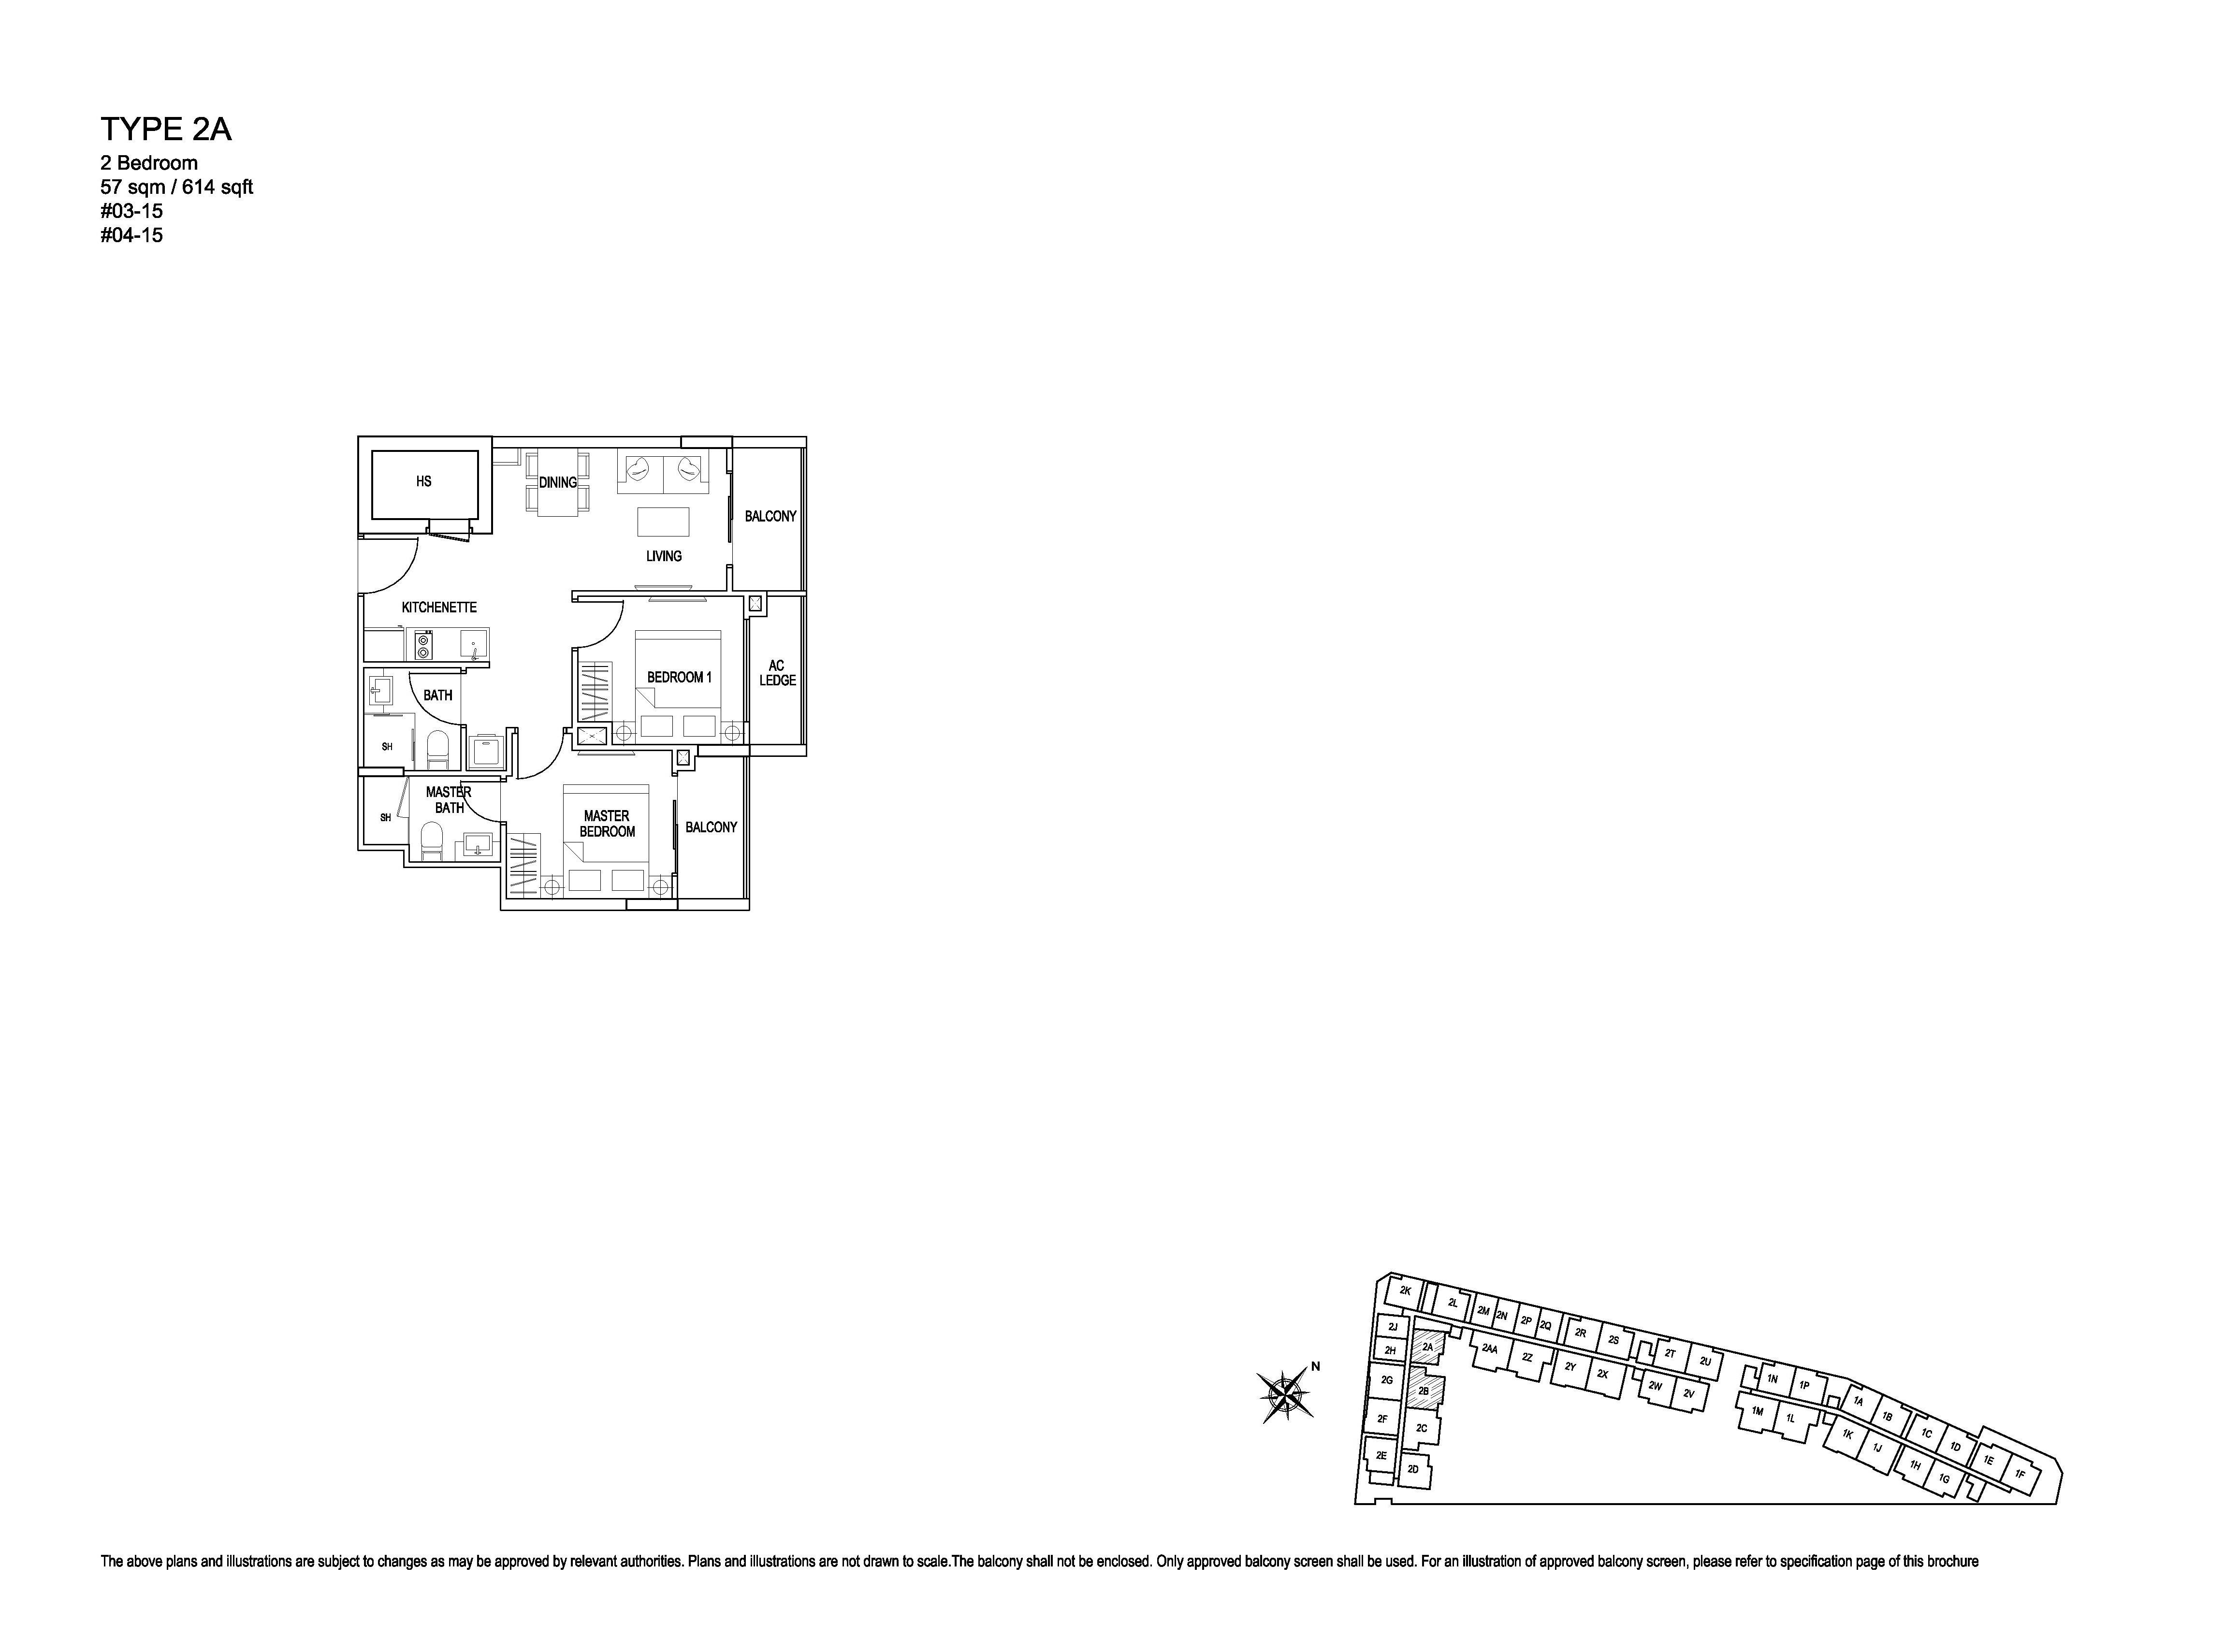 Kensington Square 2 Bedroom Floor Plans Type 2A